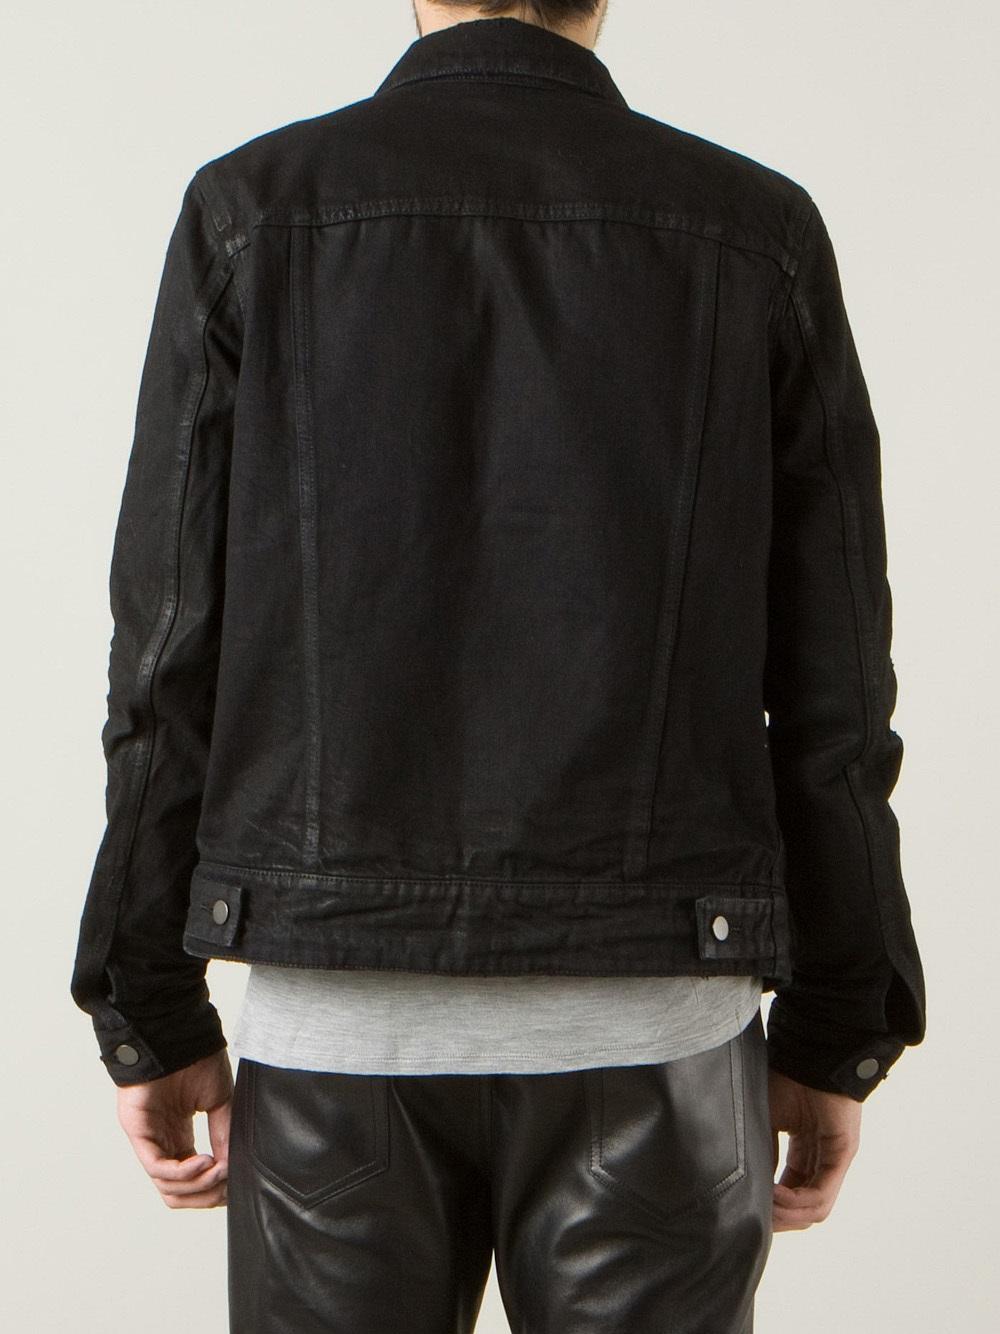 Balmain Distressed Denim Jacket in Black for Men